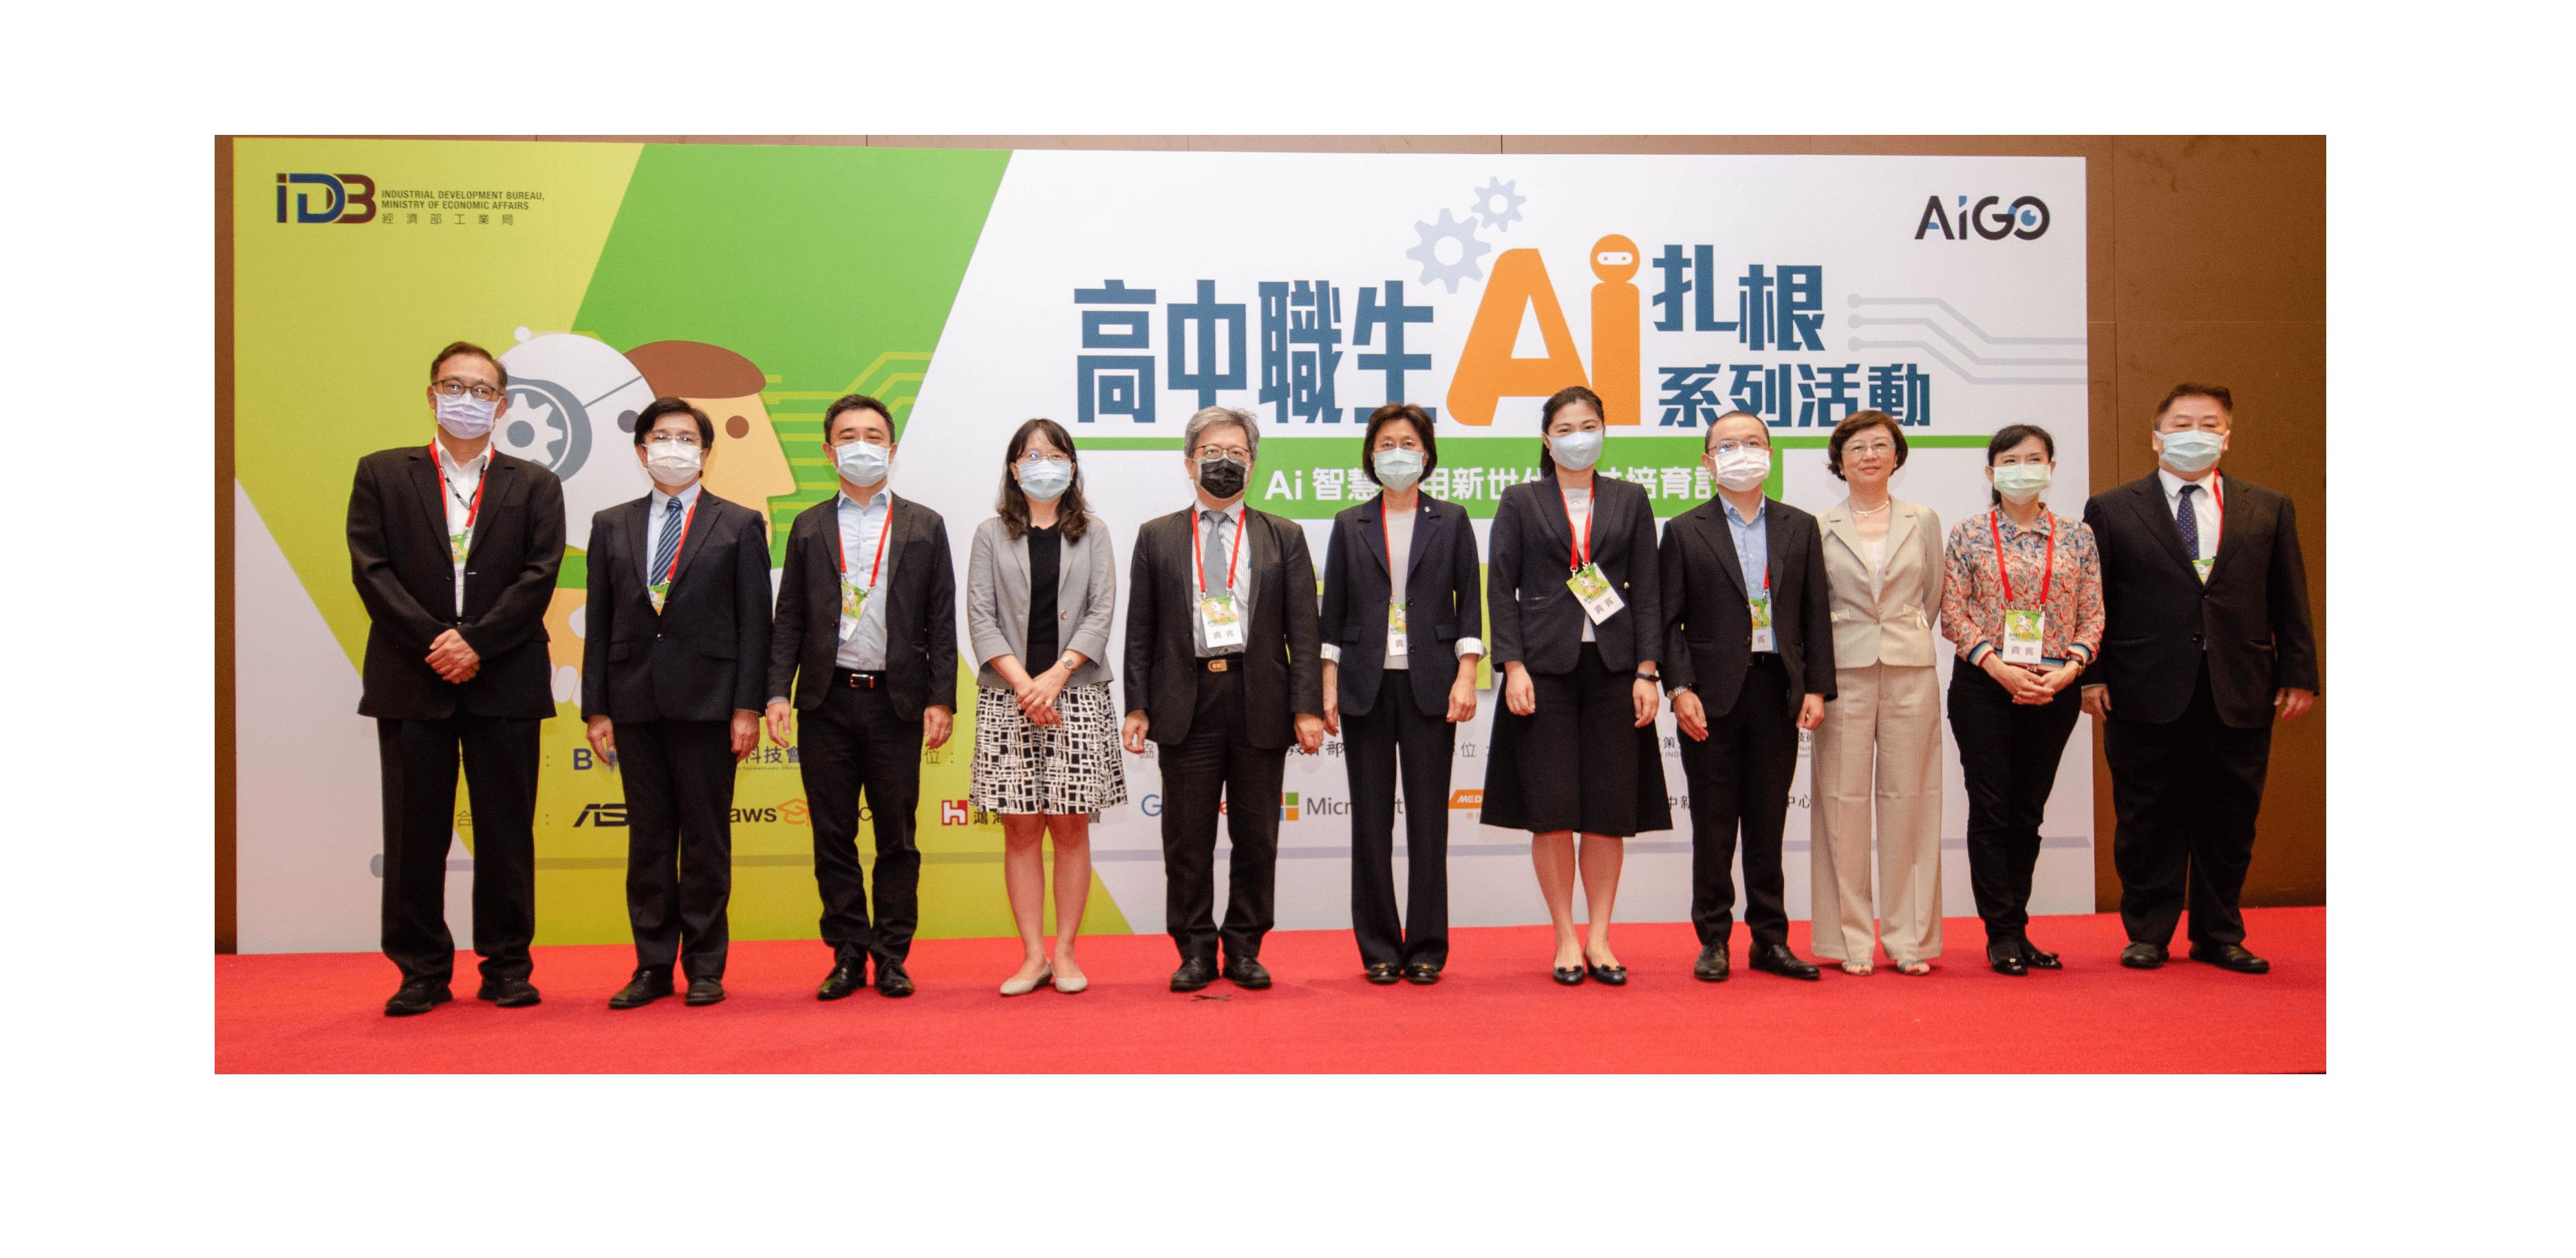 (AIGO) Program at Industrial Development